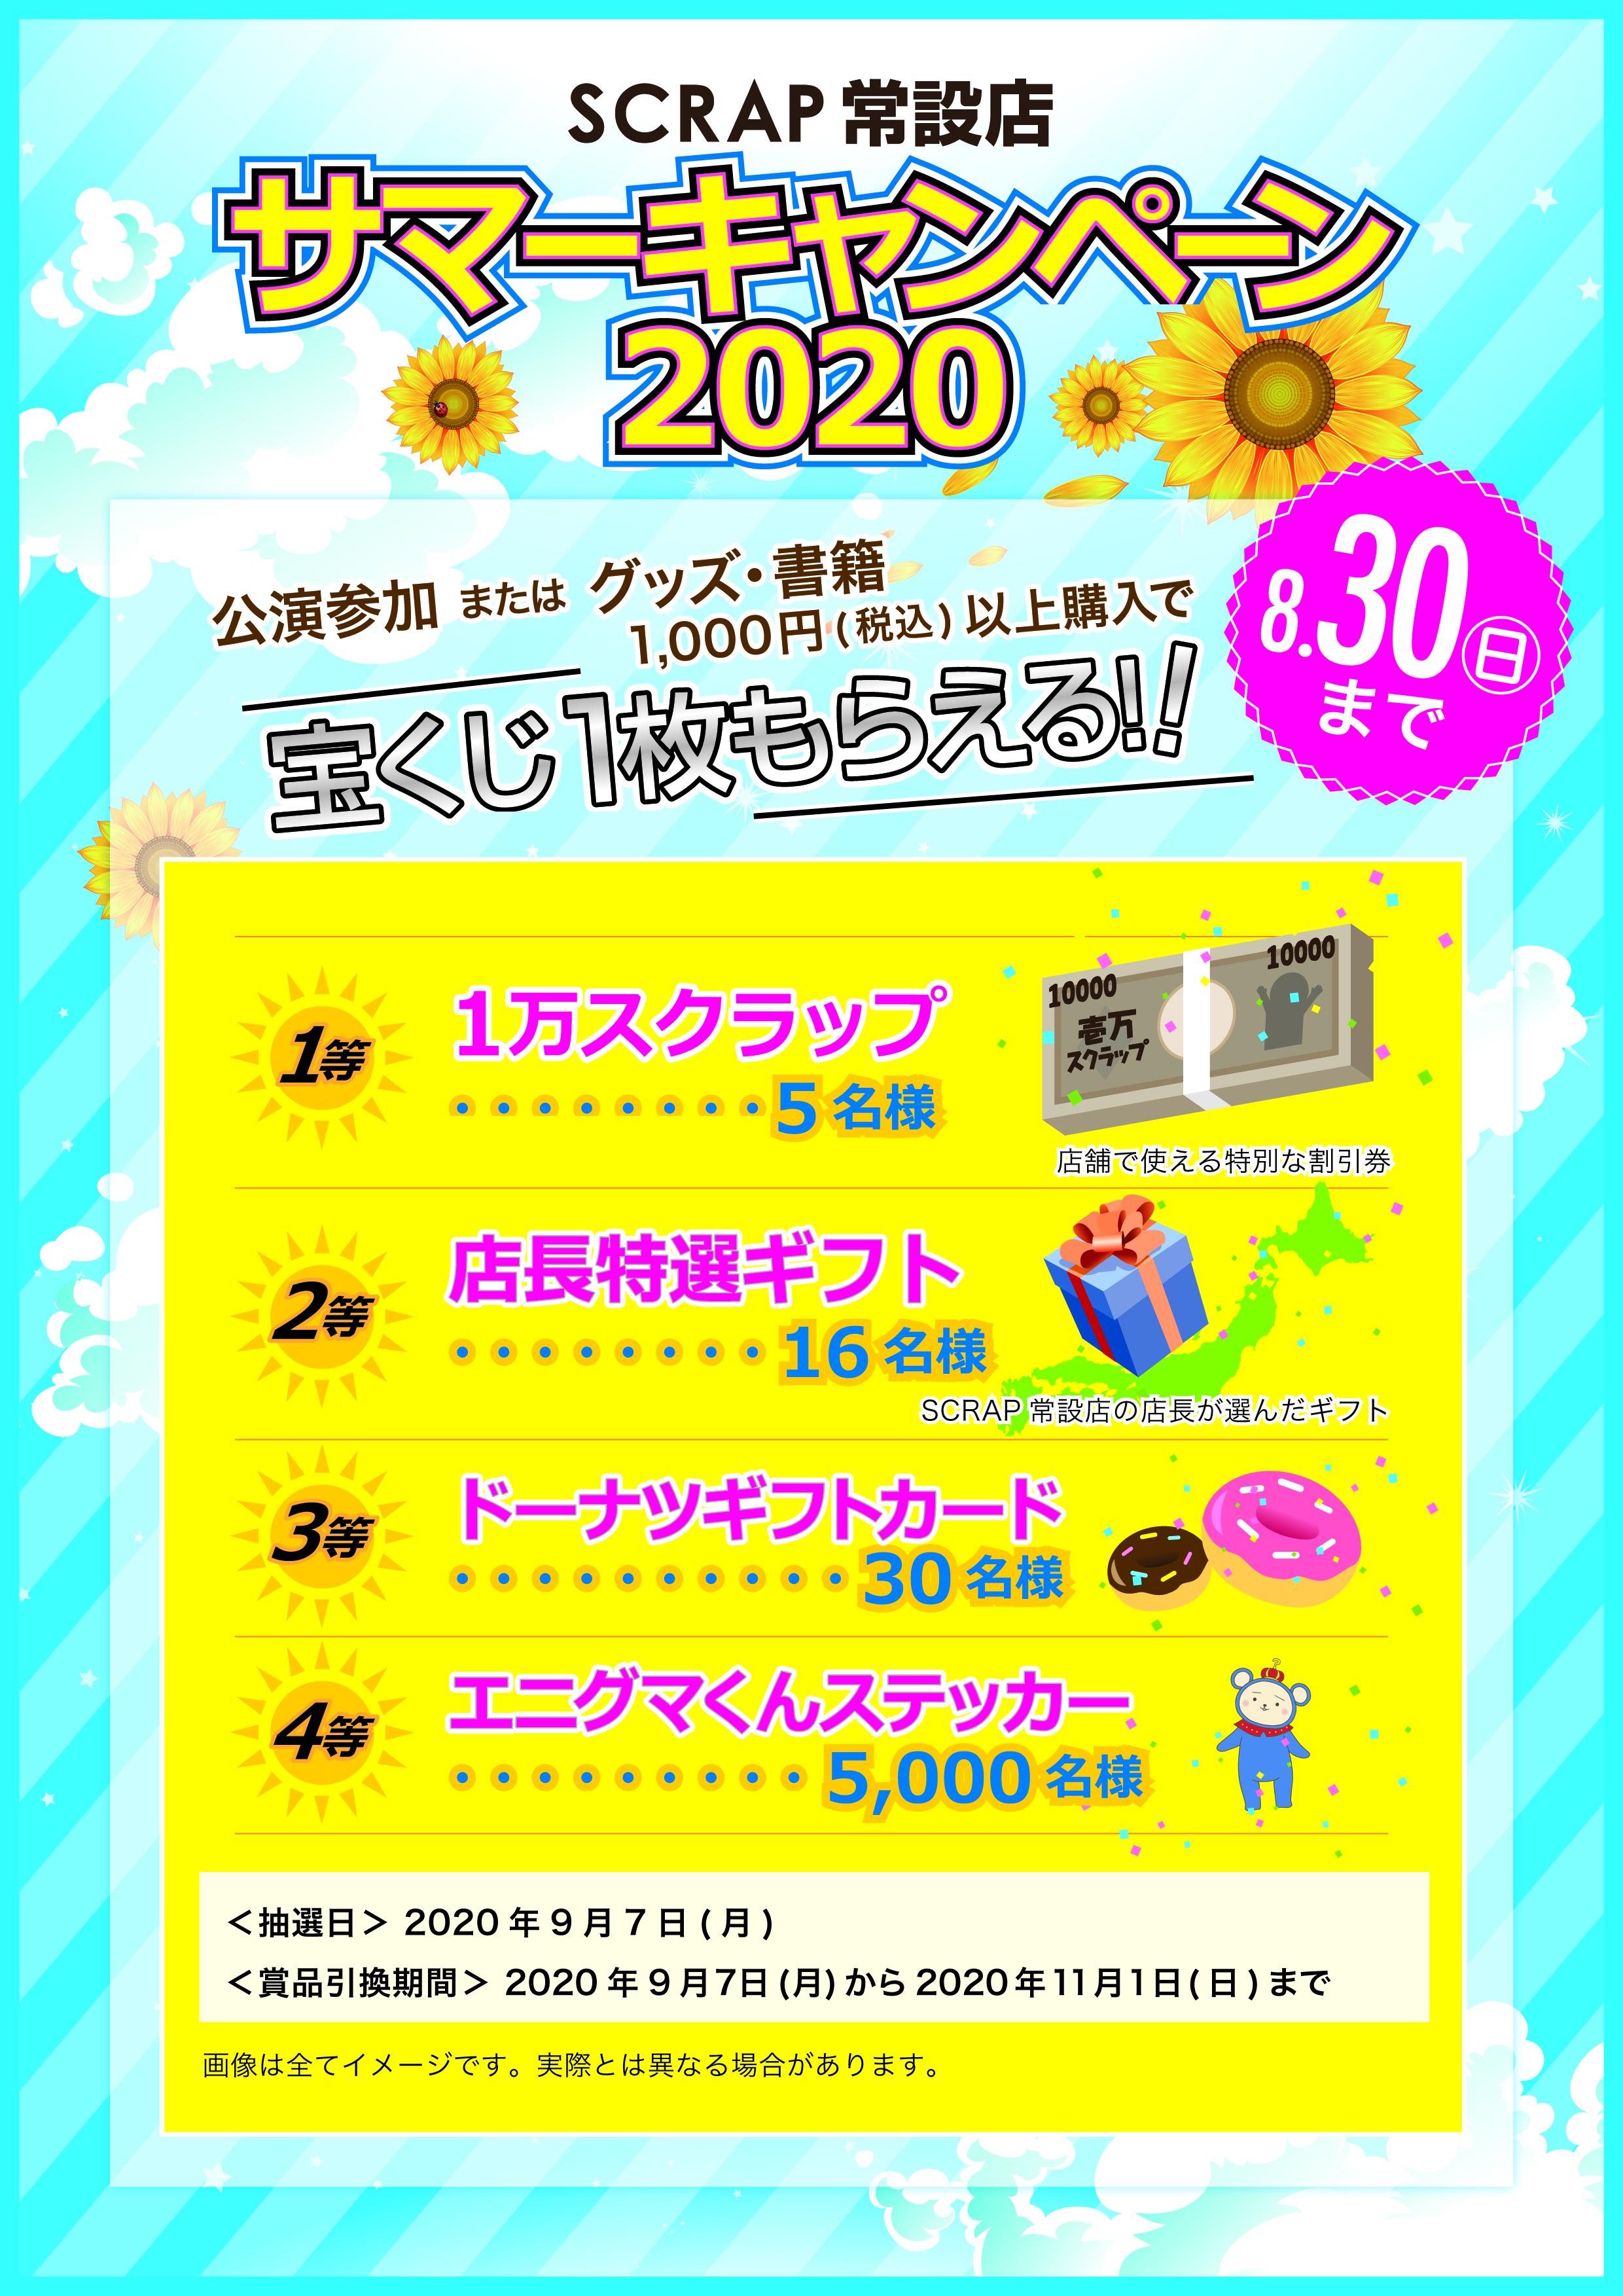 SCRAP常設店サマーキャンペーン2020